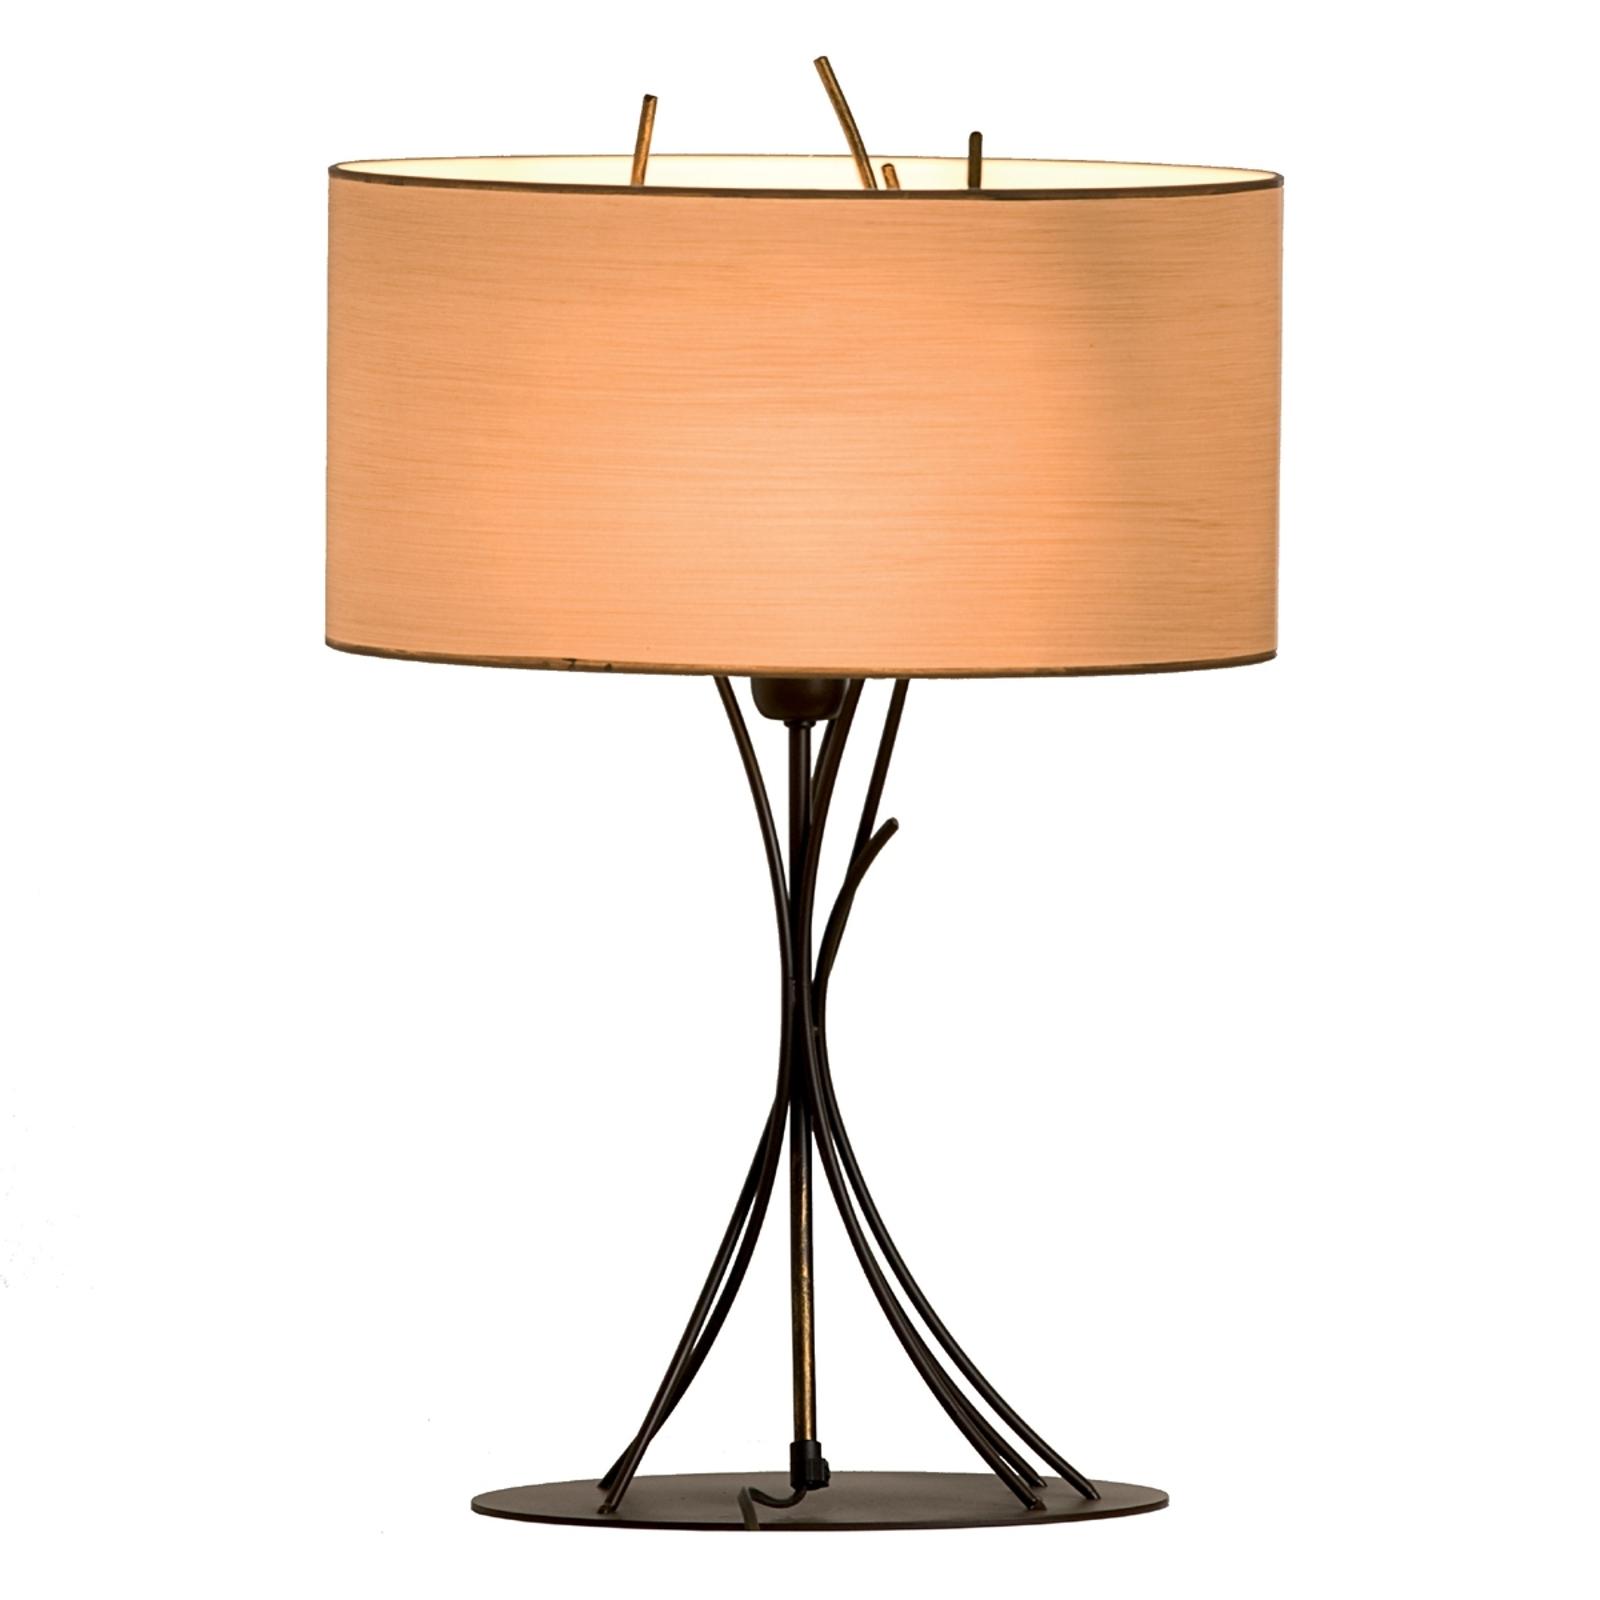 LIVING OVAL - elegante tafellamp